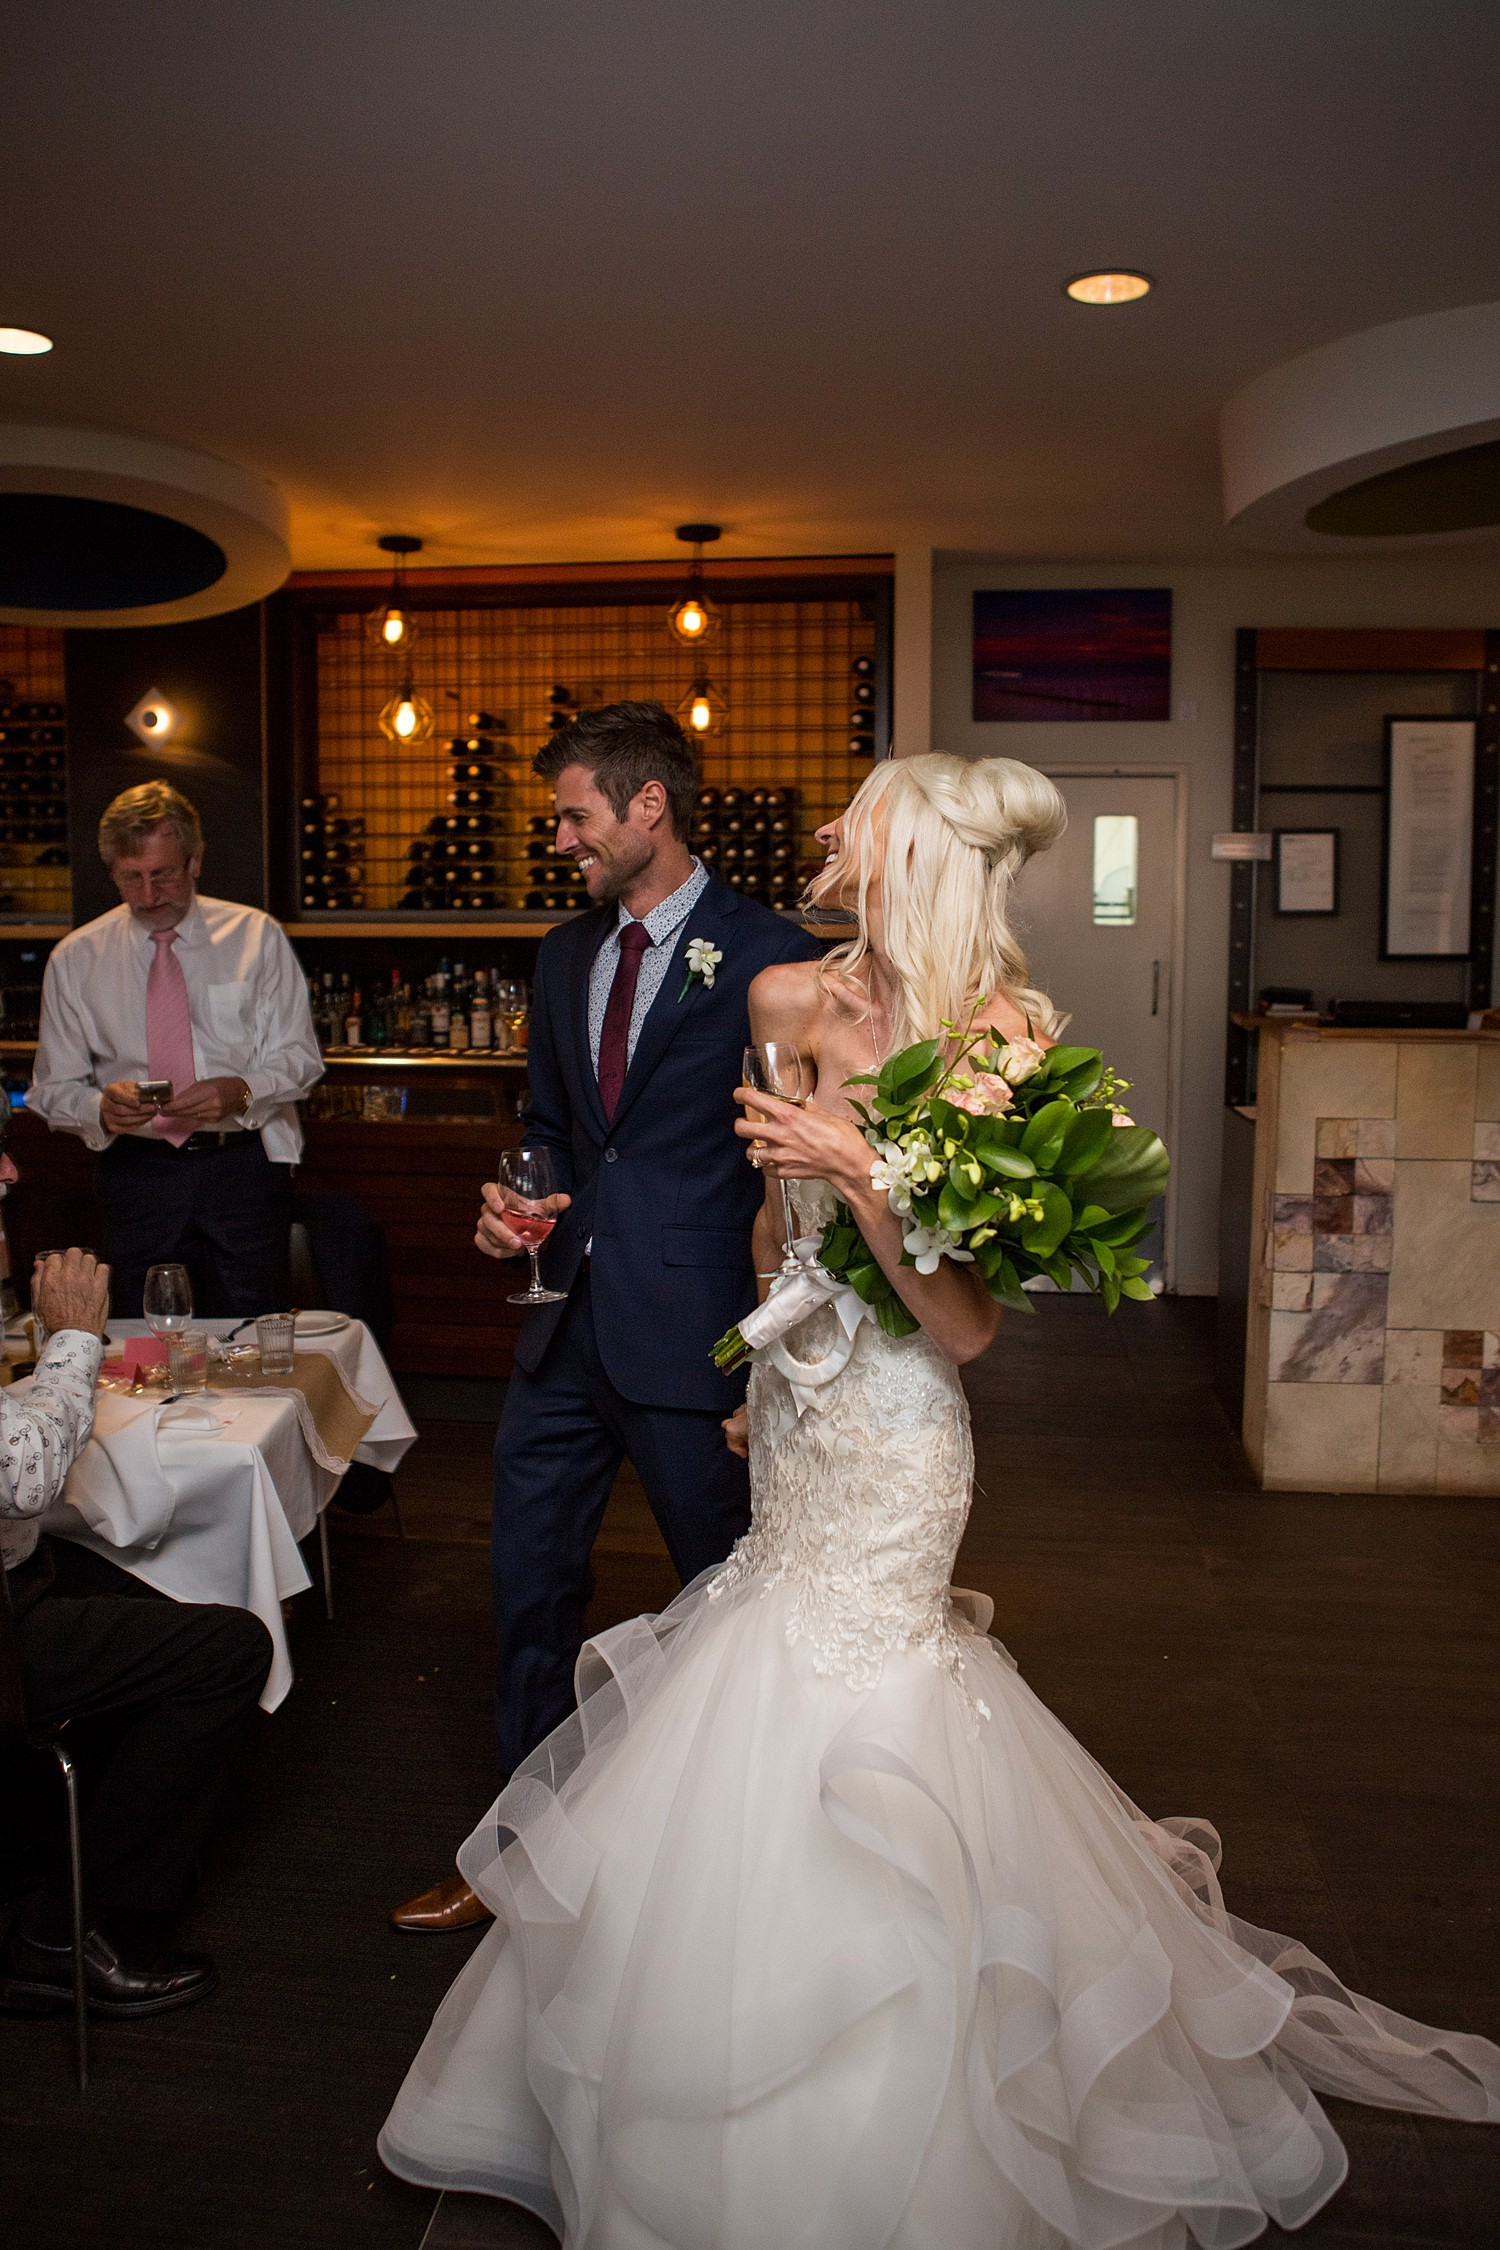 wise_wines_southwest_WA_wedding_0157.jpg